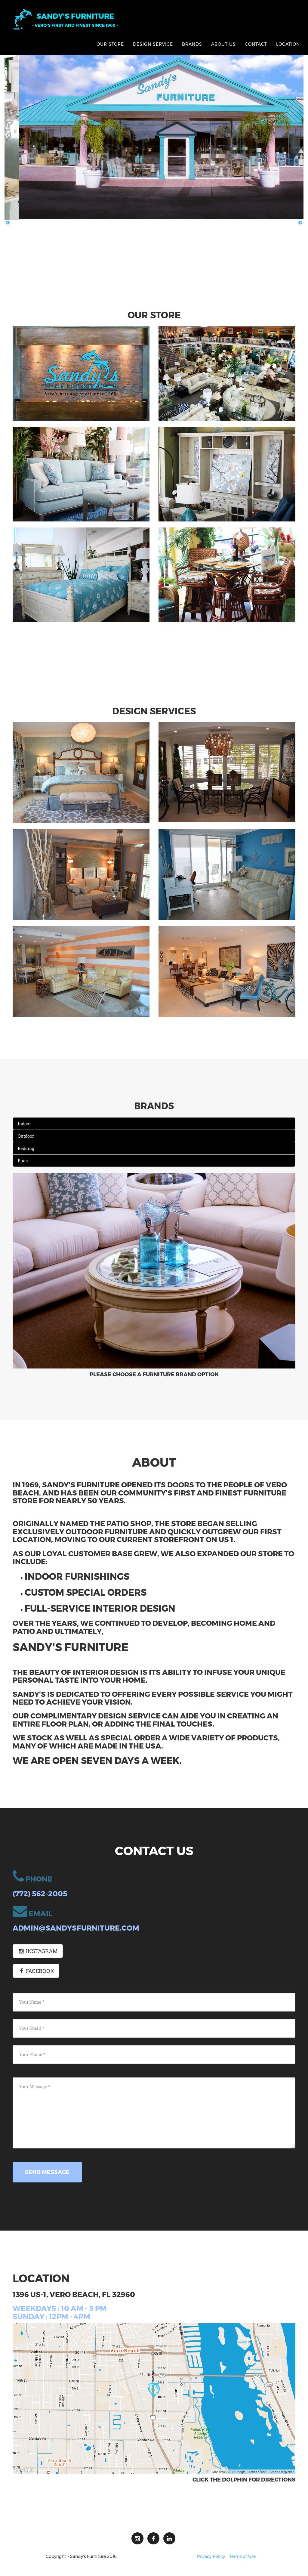 Sandy S Furniture Of Vero Beach Website History